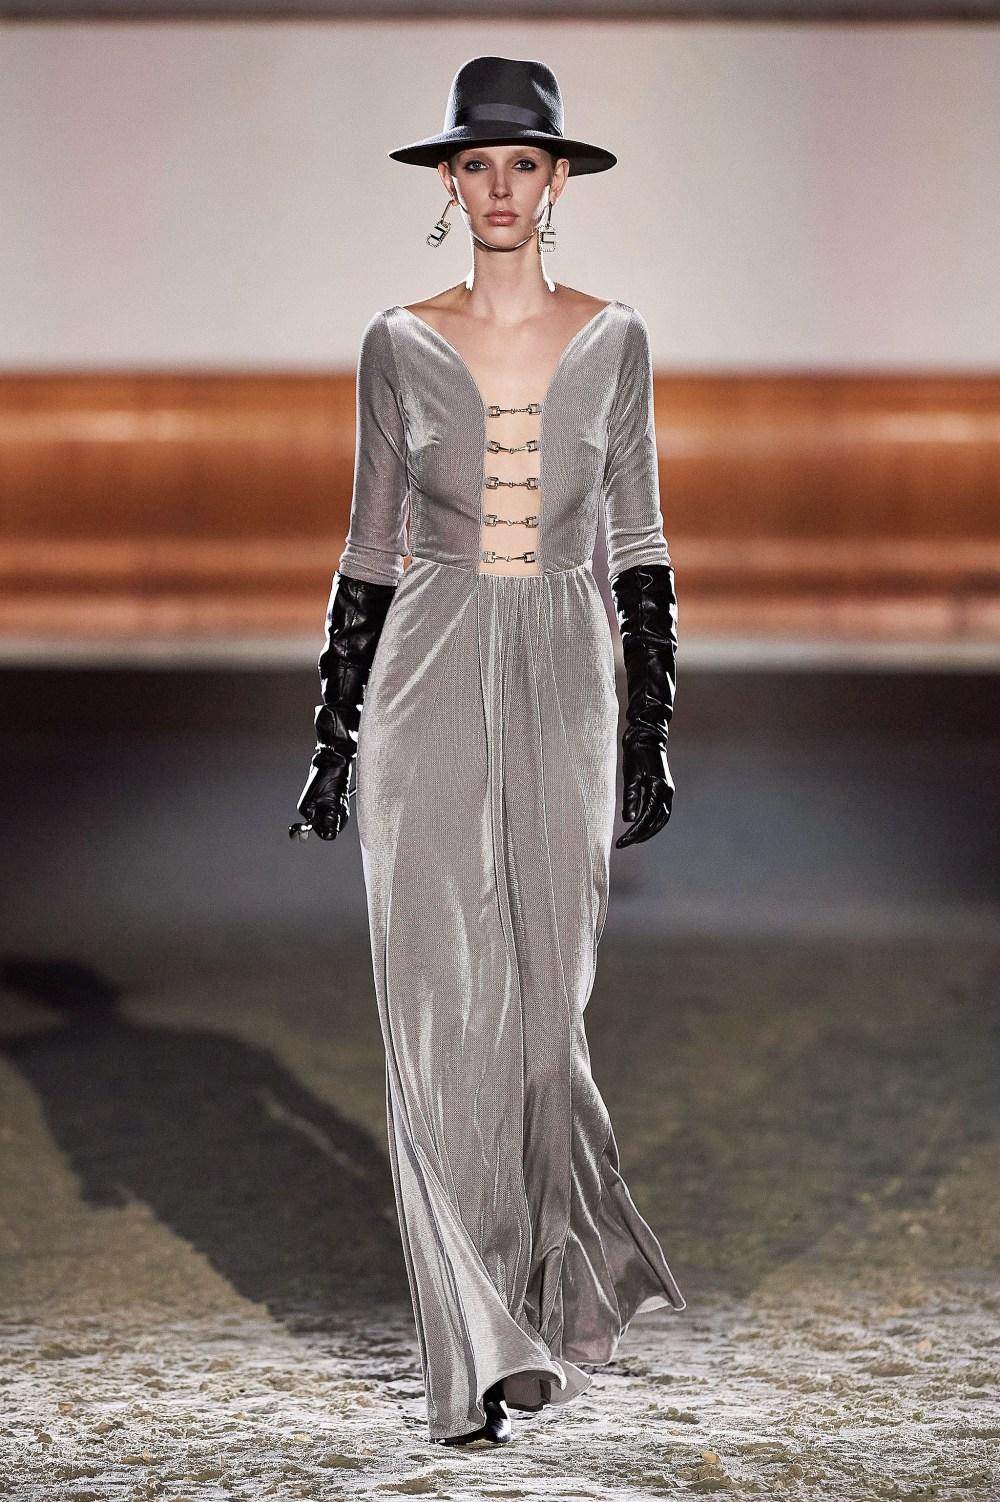 Elisabetta Franchi: Elisabetta Franchi Fall Winter 2021-22 Fashion Show Photo #34